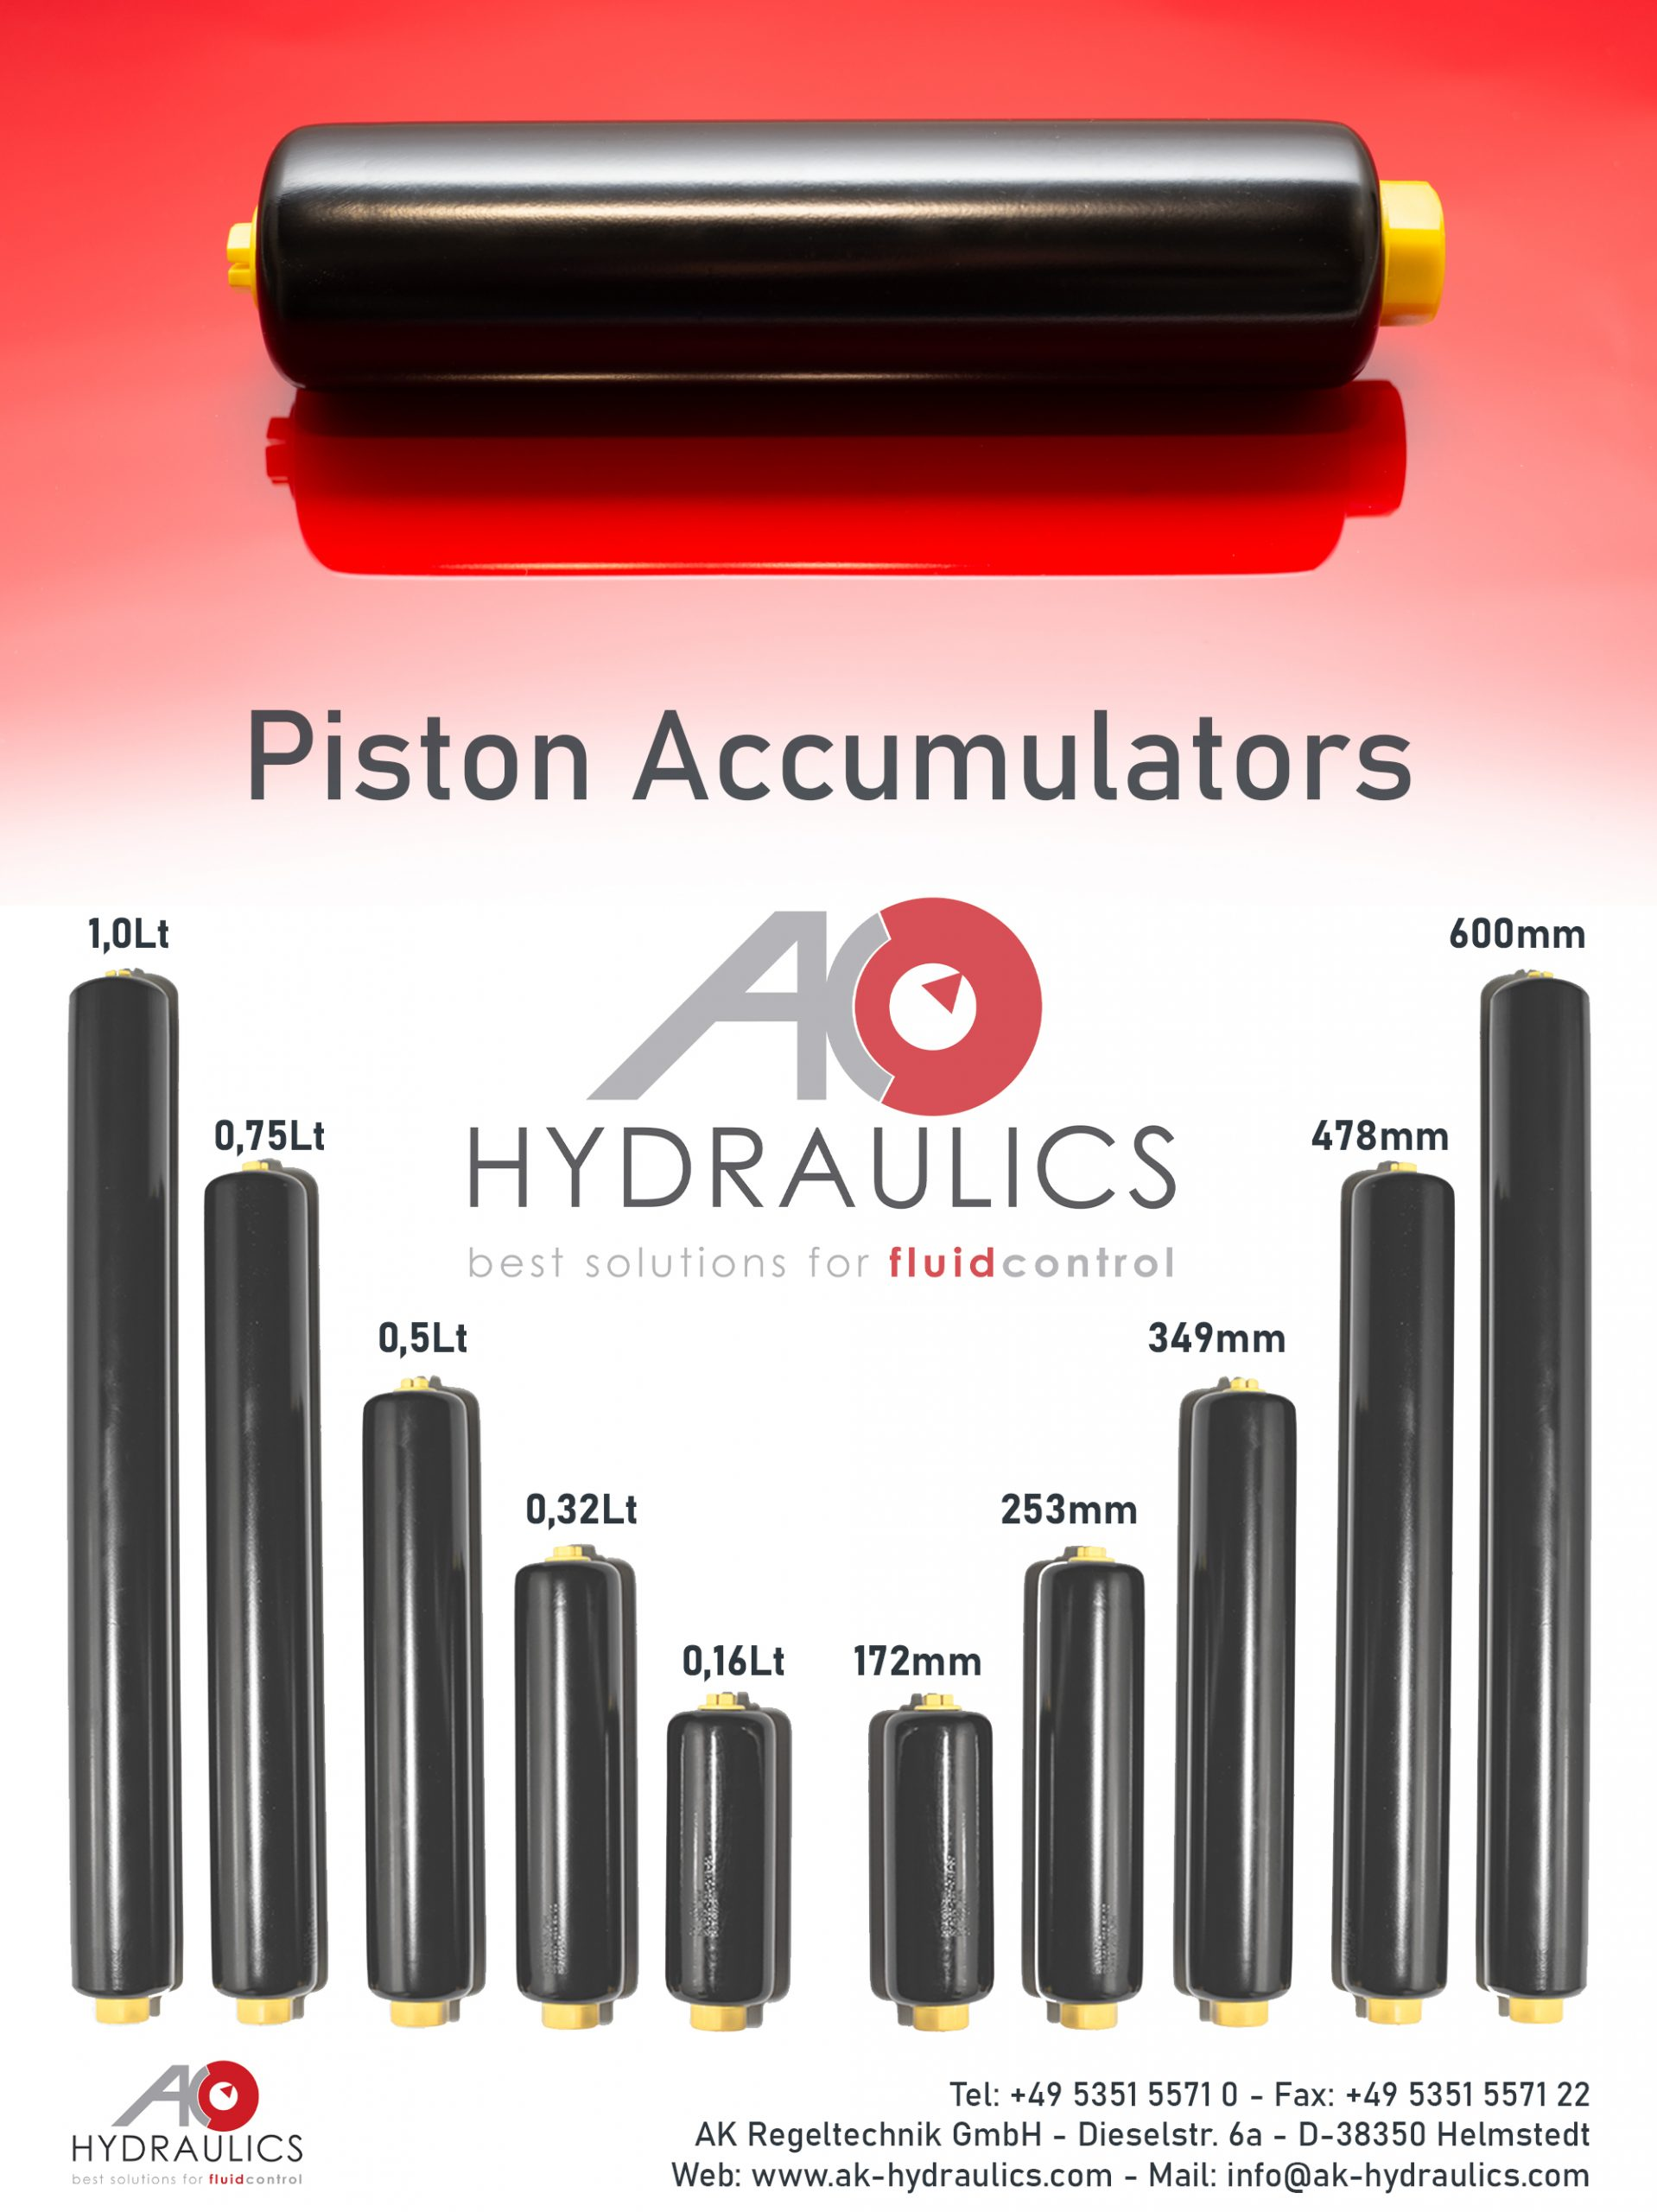 Kolbenspeicher – AK Regeltechnik – Piston Accumulators 1